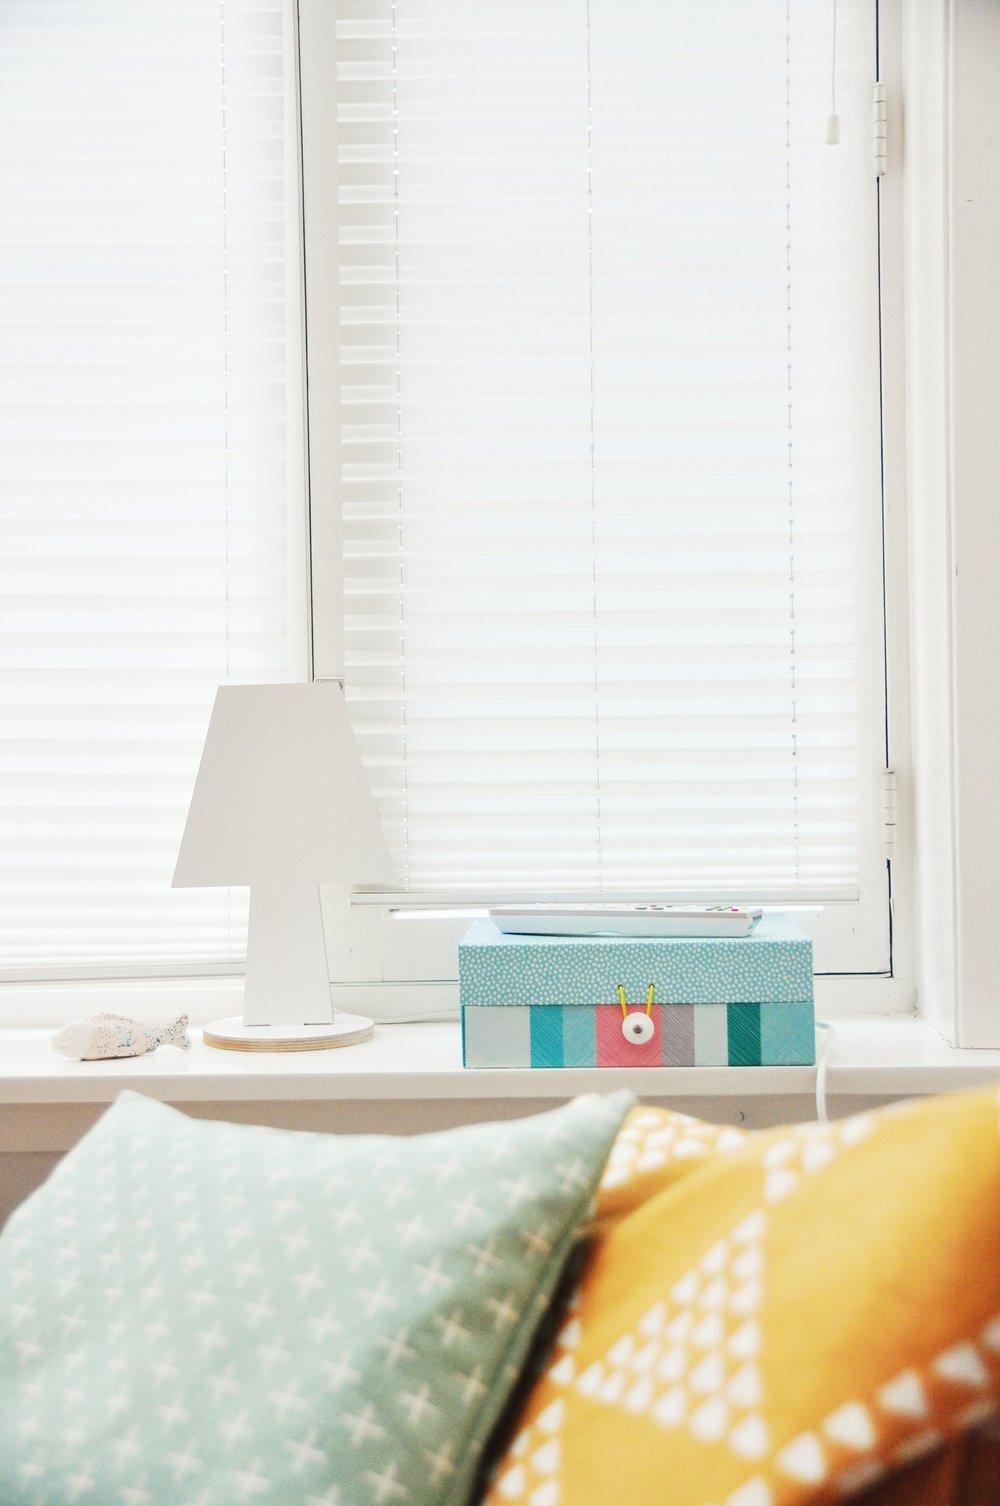 white-house-interior-home-color-curtain-891862-pxhere.com.jpg